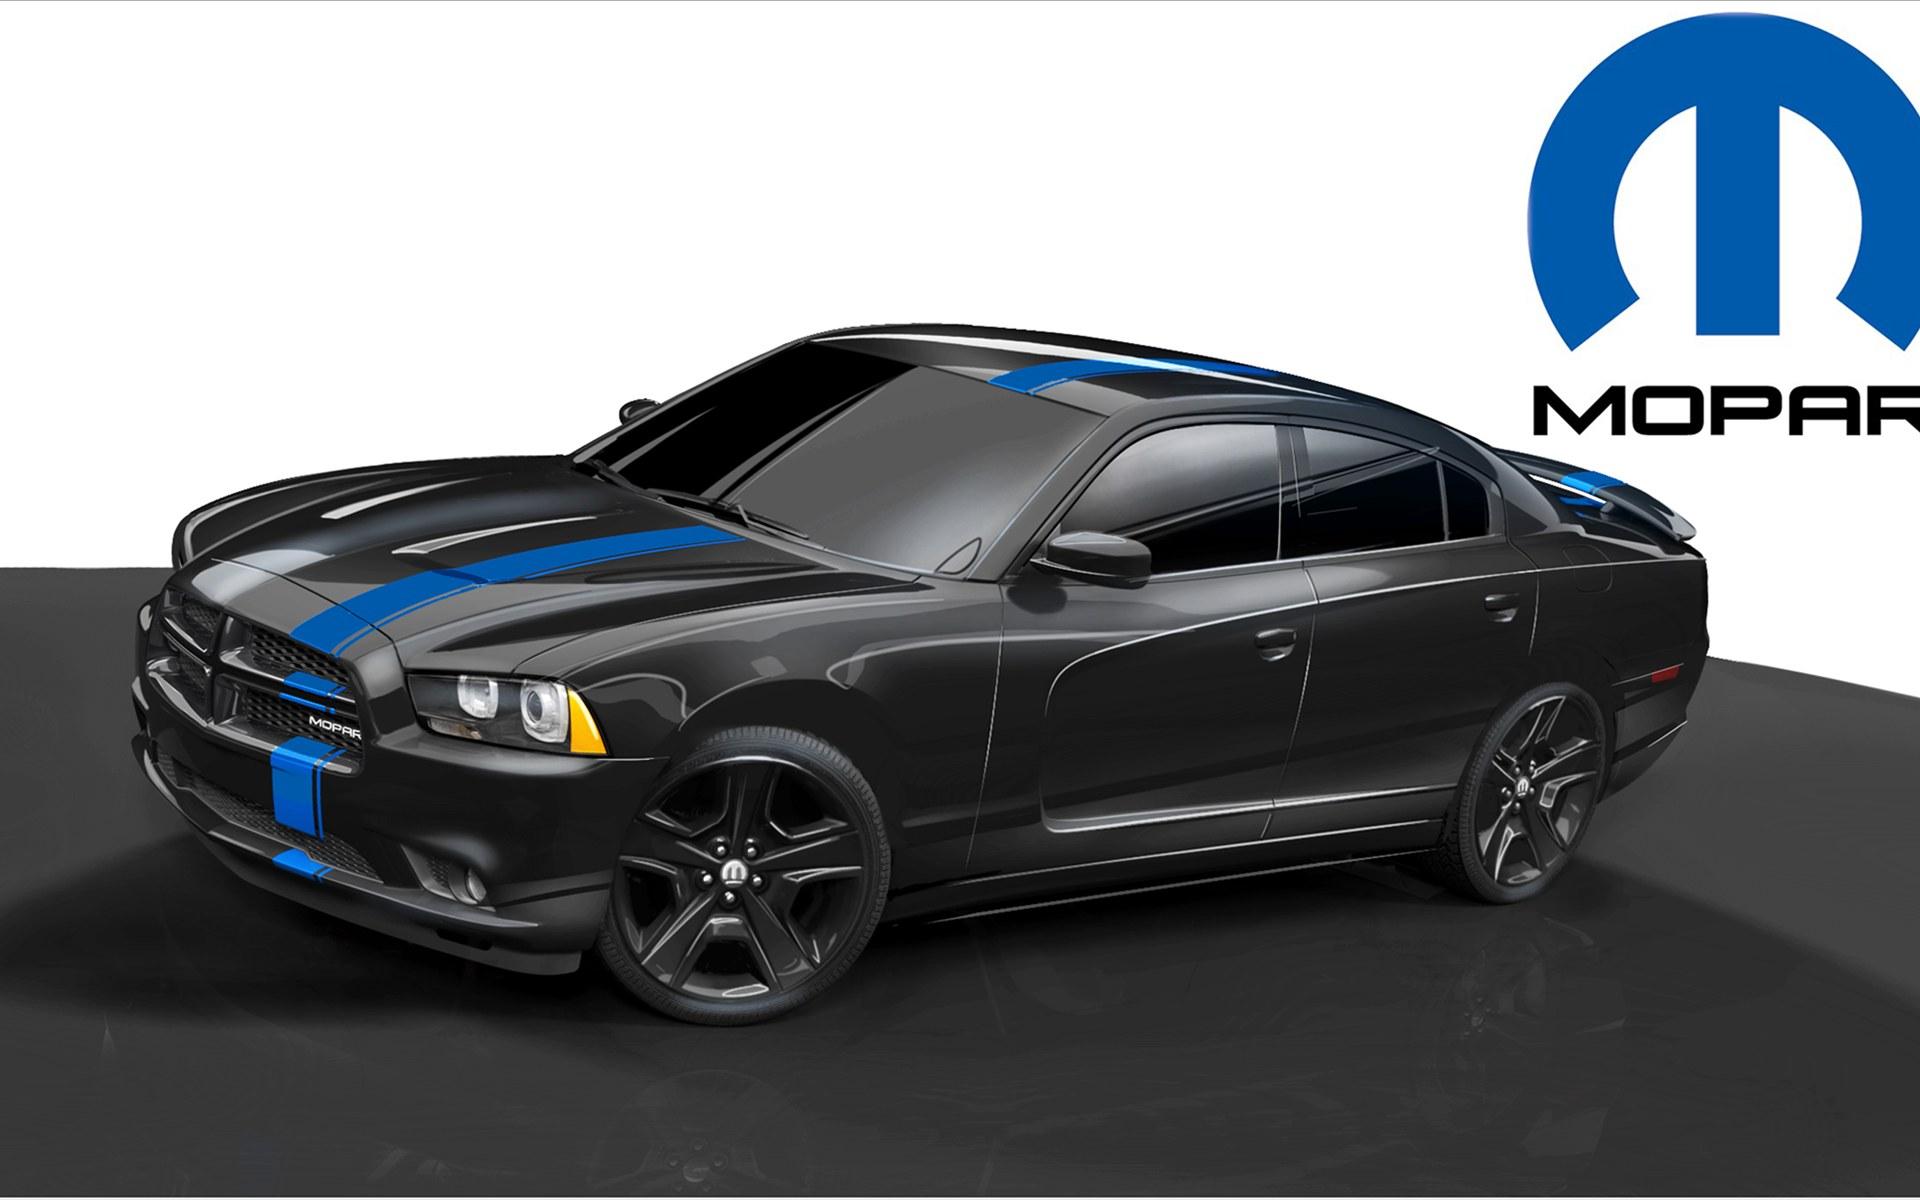 Dodge Trazo  Best quality free high resolution car